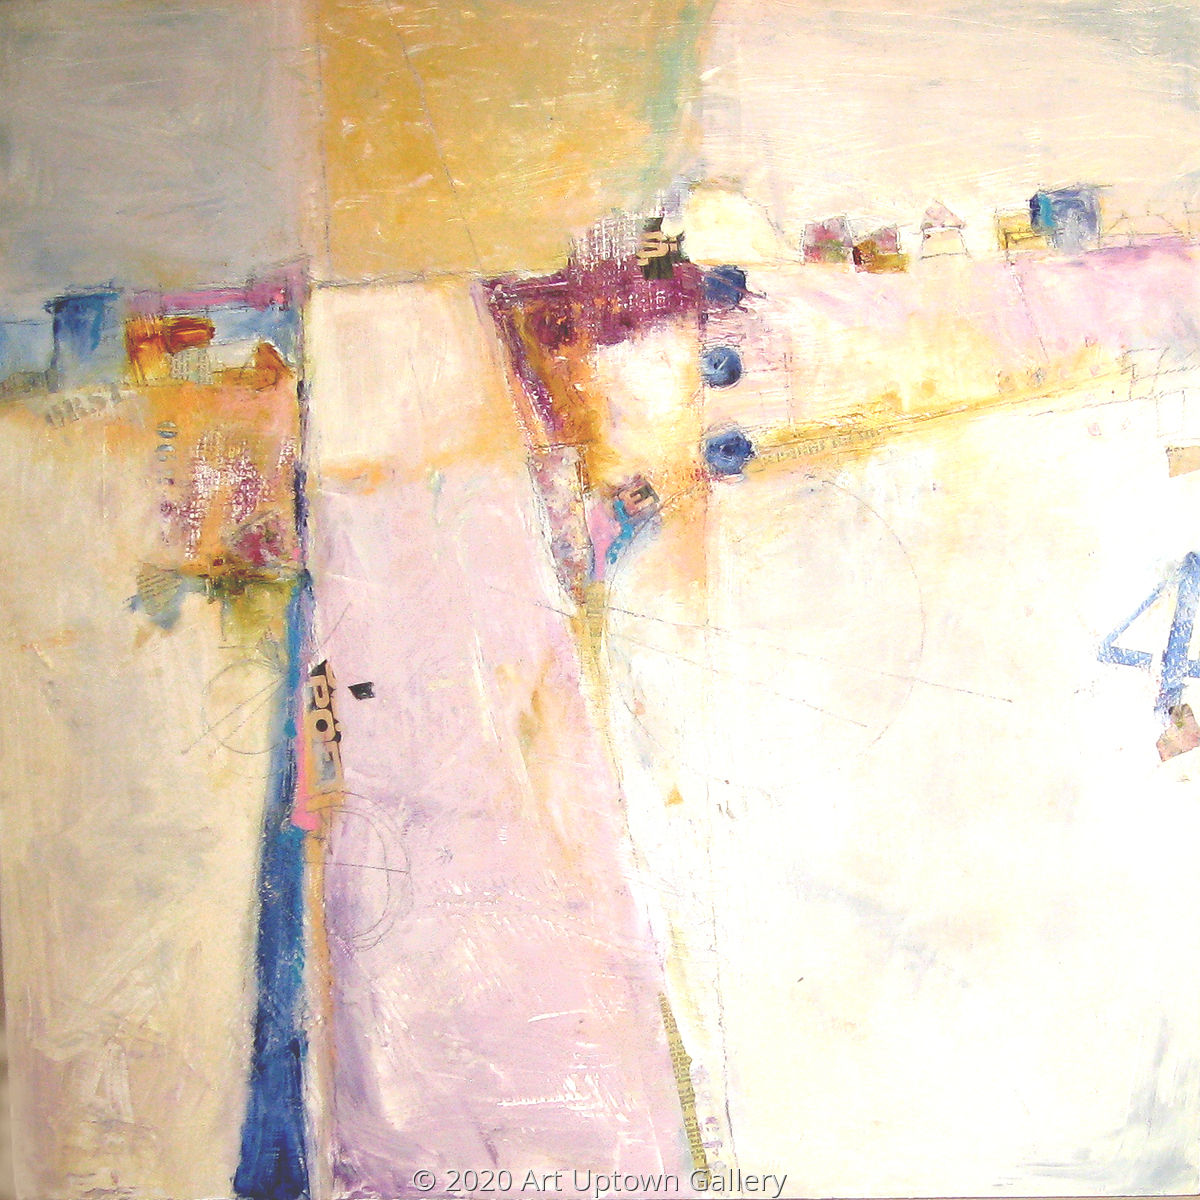 'LANDSCAPE No. 4' by Krasner (large view)